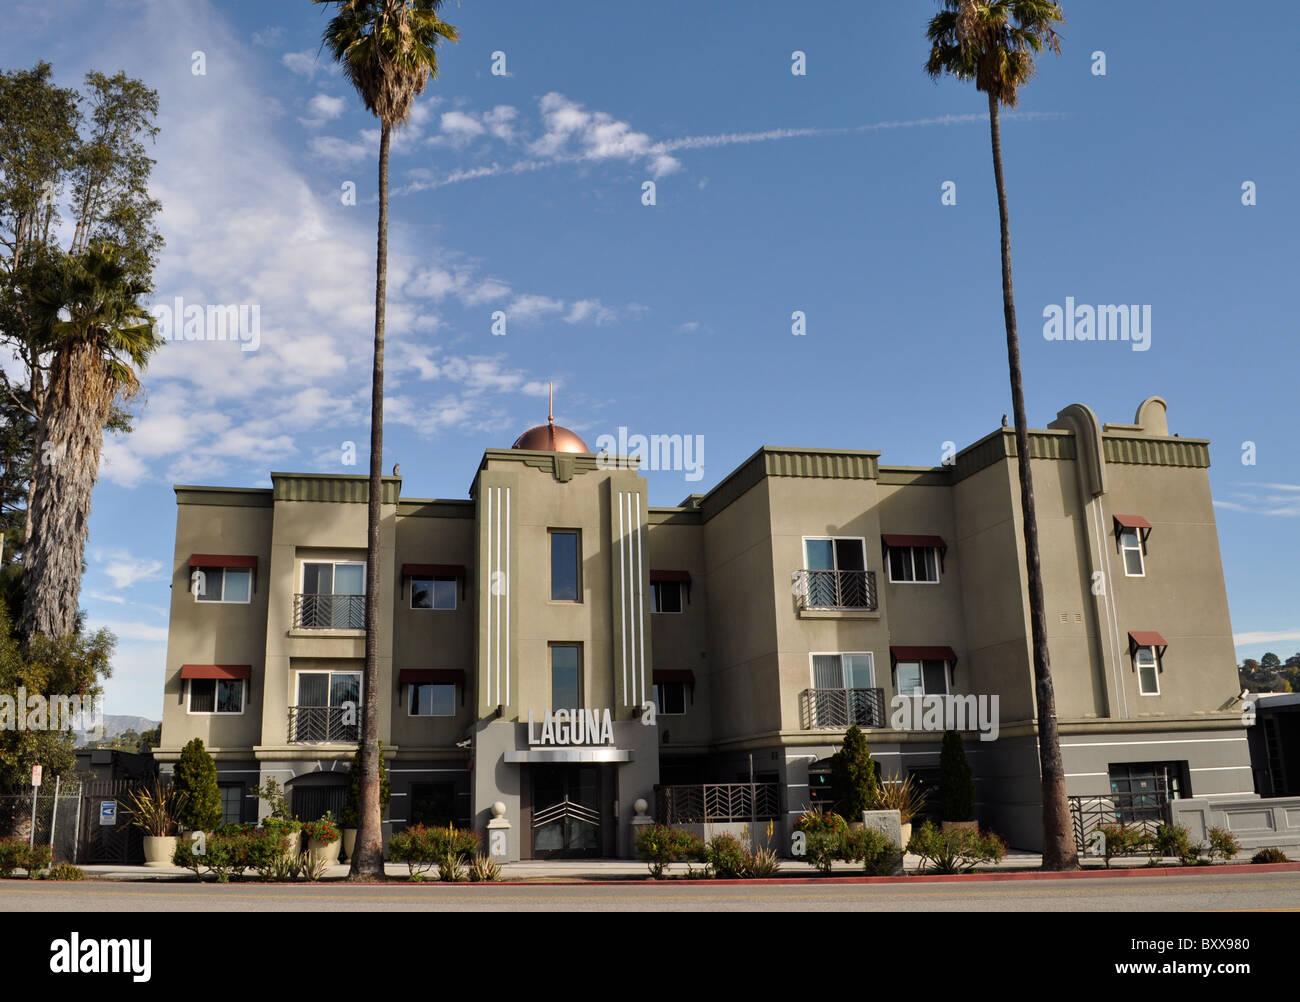 https://c8.alamy.com/comp/BXX980/laguna-art-deco-apartments-sunset-boulevard-los-angeles-BXX980.jpg